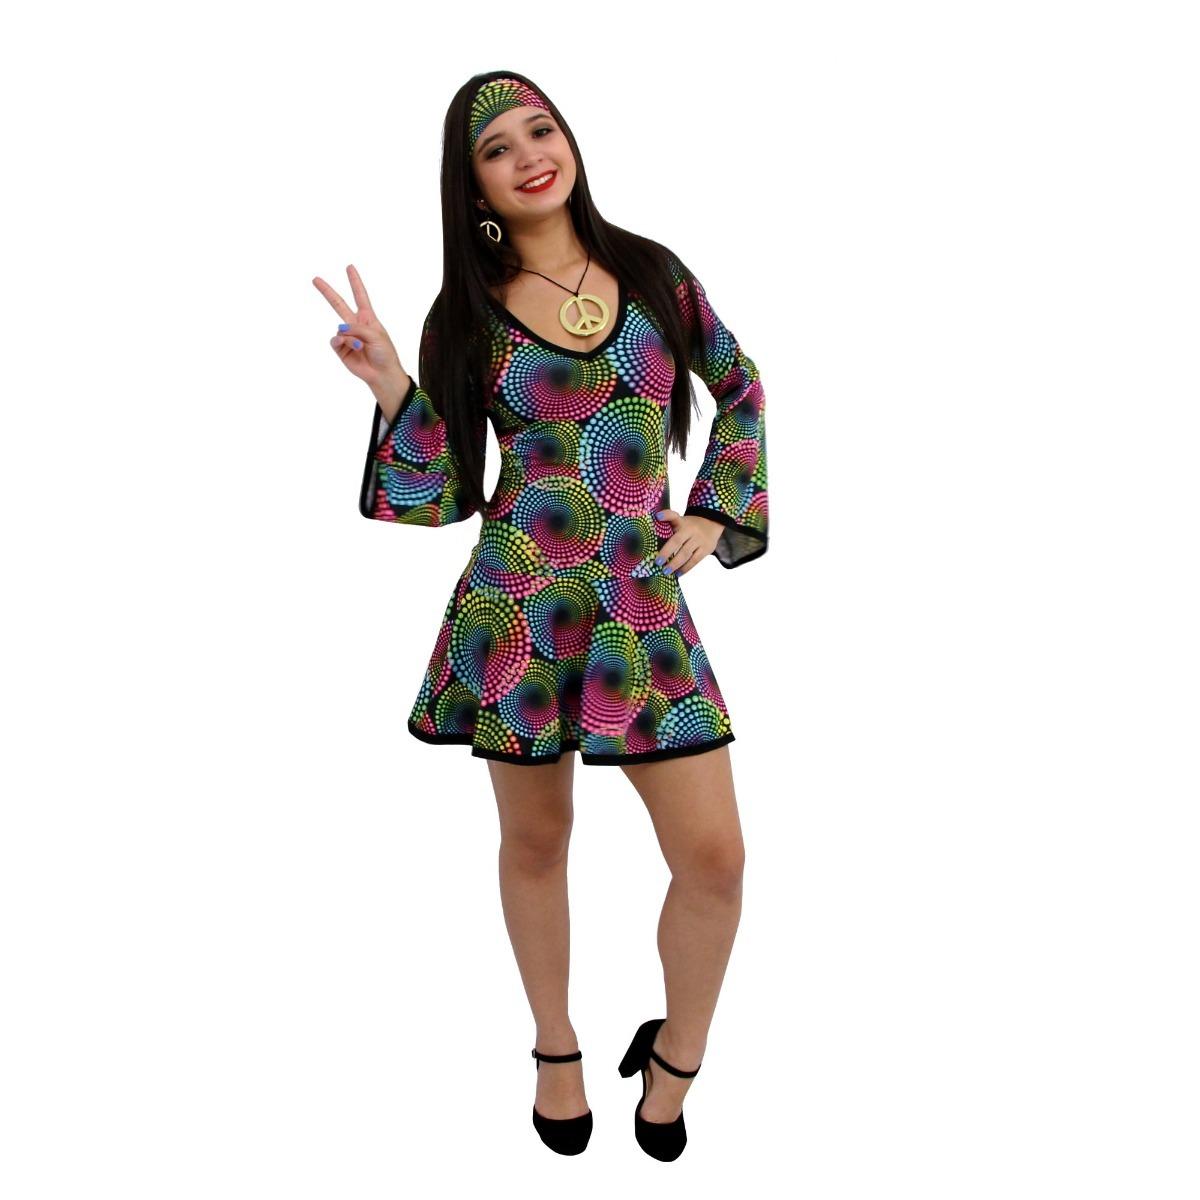 Fantasia hippie feminina adulto vestido anos 70 roupa - Moda hippie anos 70 ...